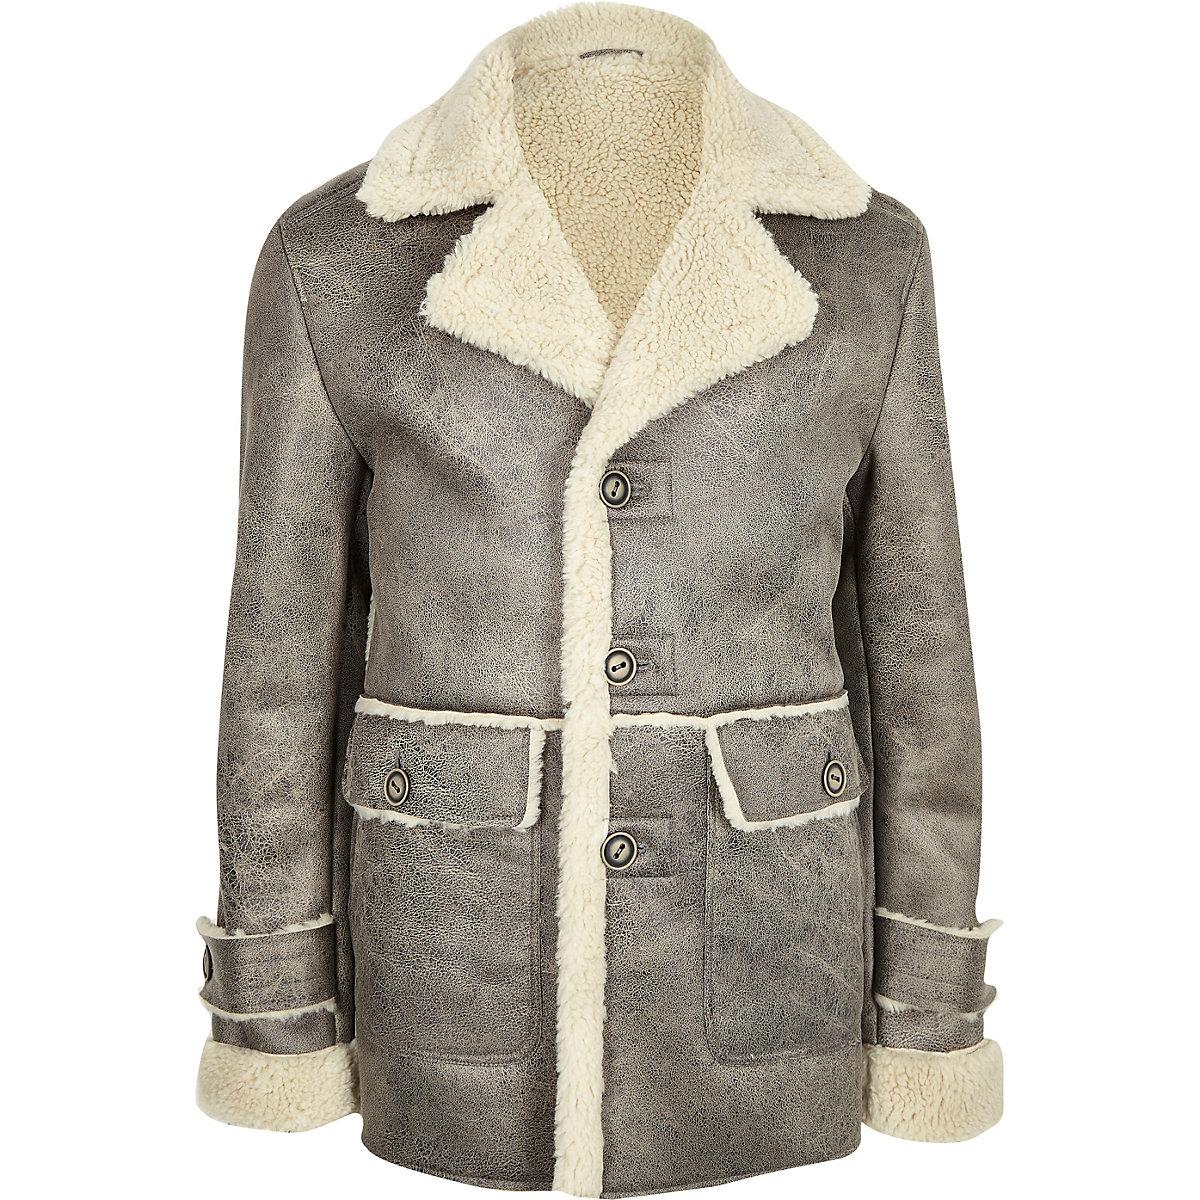 Grey Shearling Lined Button Down Jacket Jackets Coats Jackets